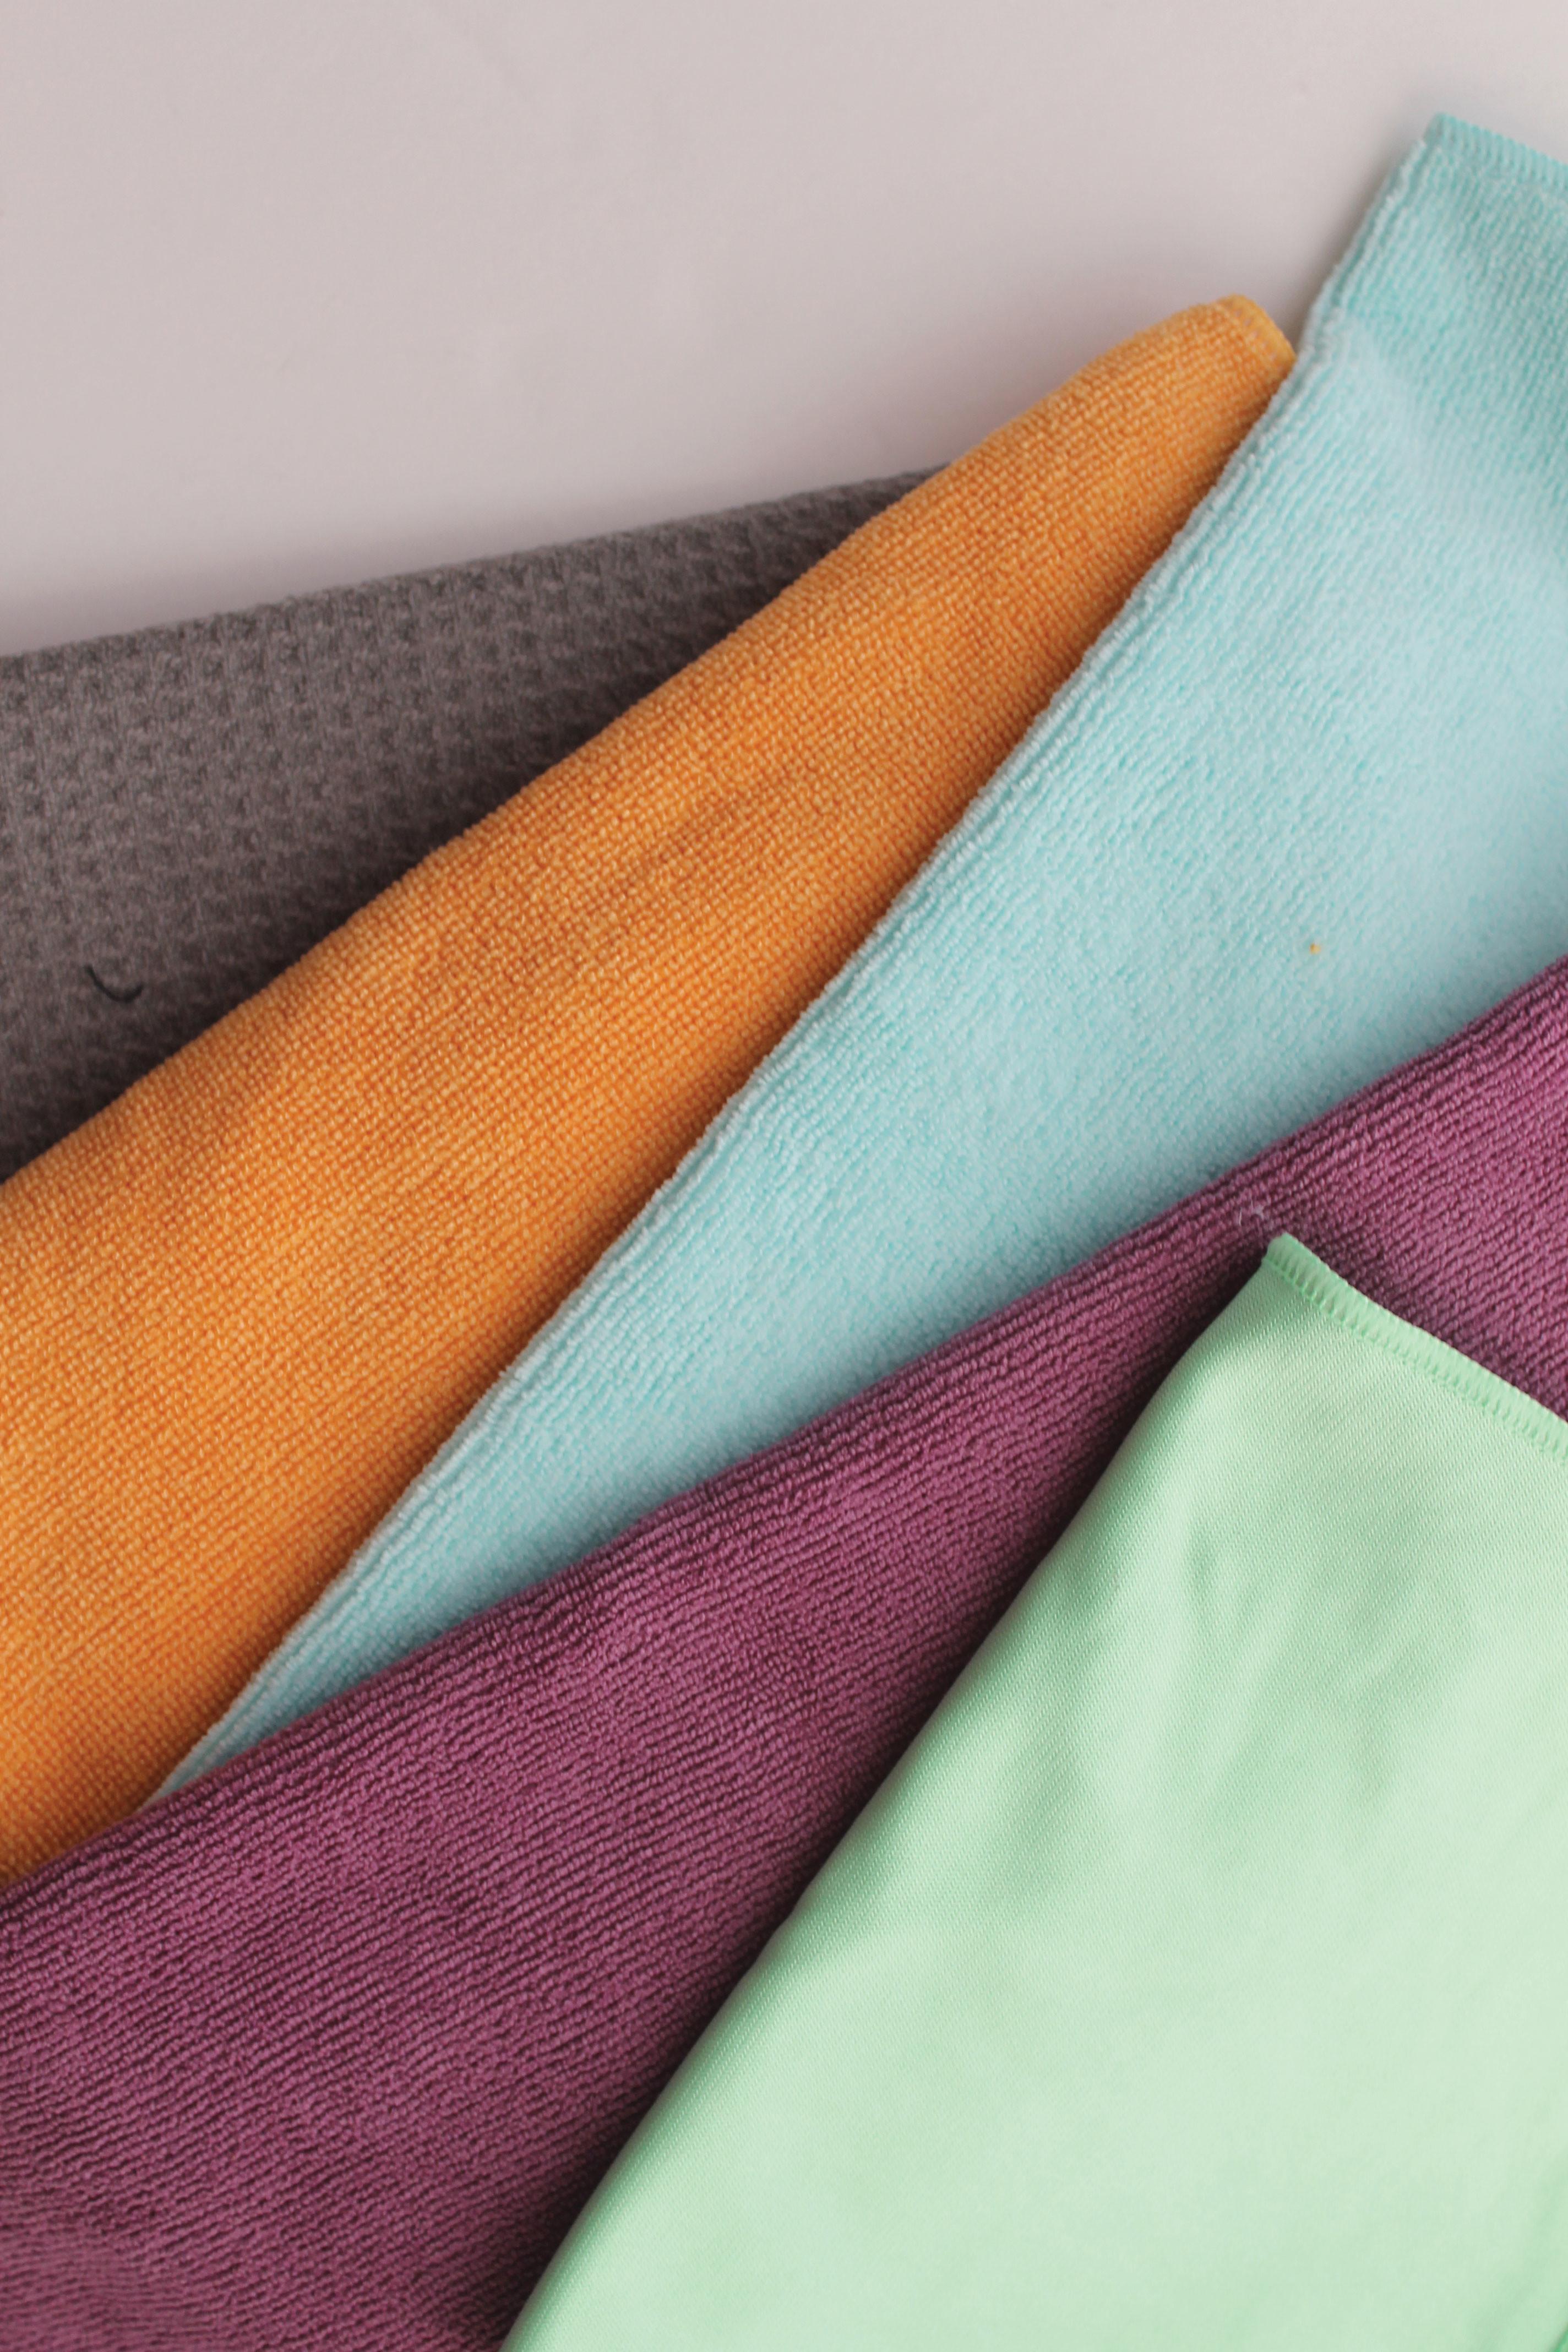 kait schulhof san diego sustainability microfiber cloths